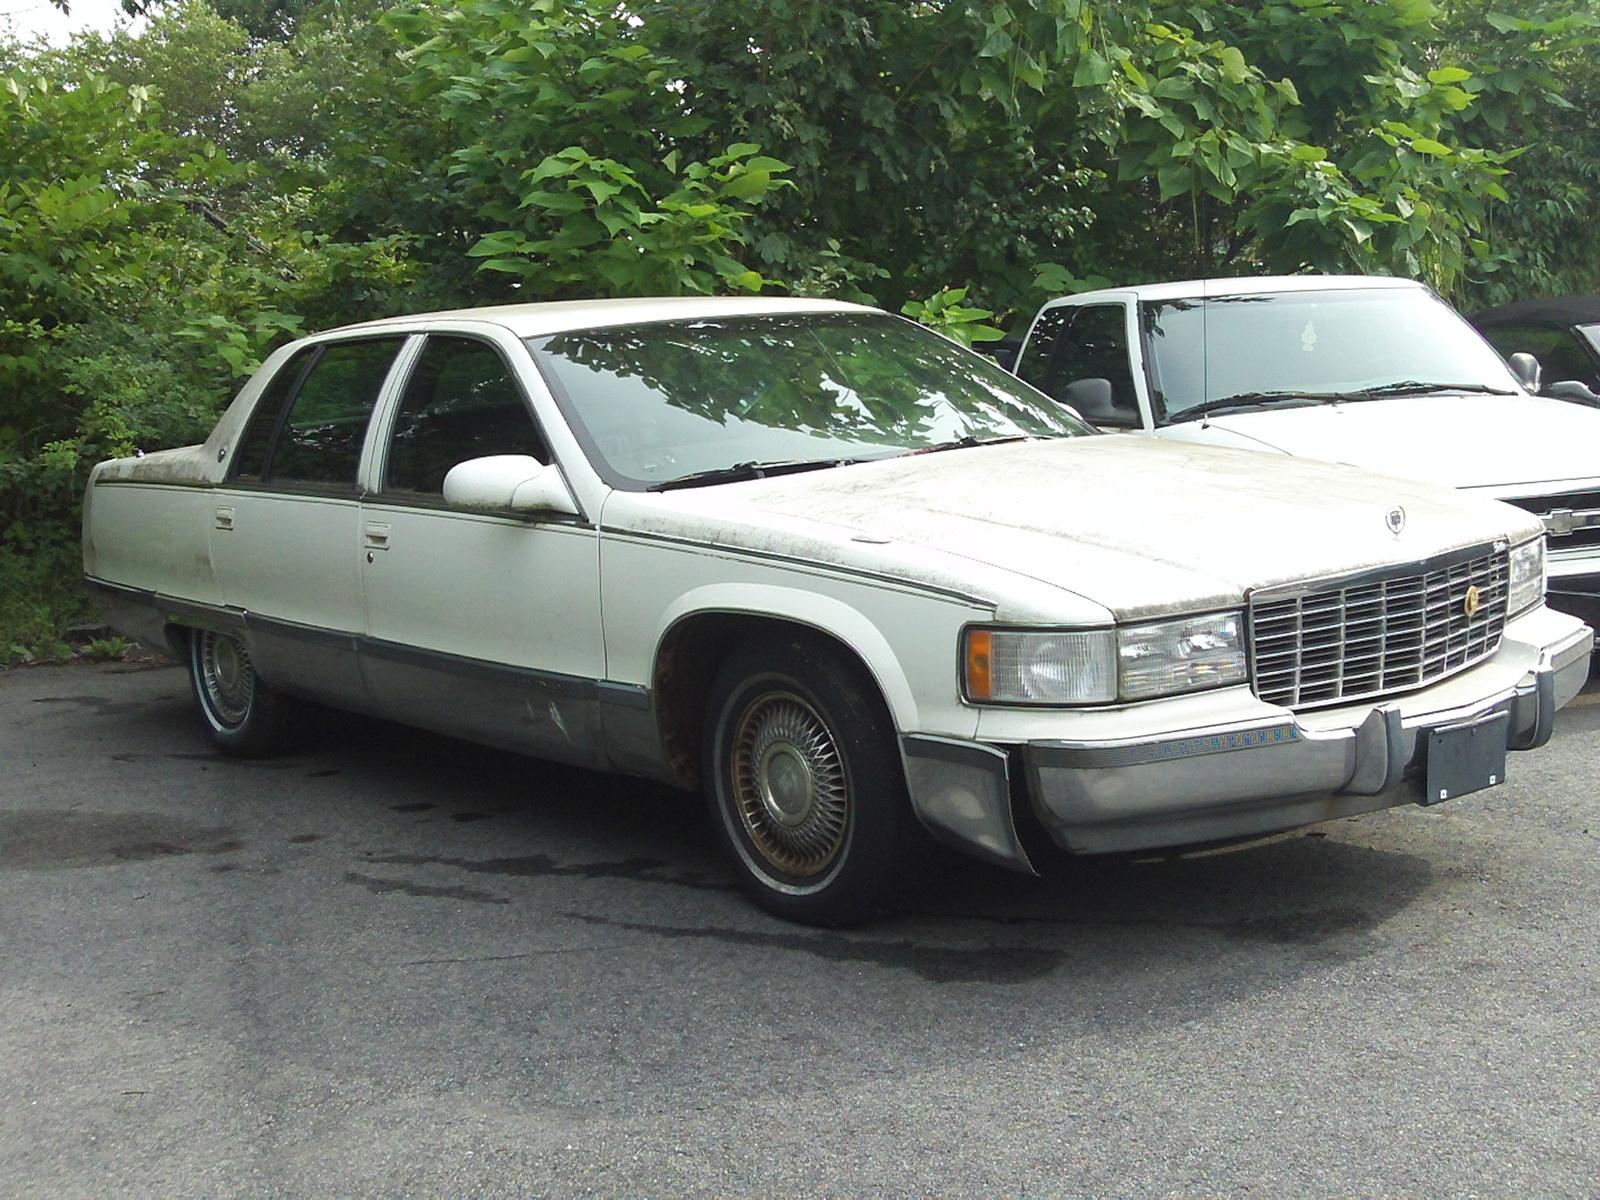 1993 Cadillac Fleetwood - Overview - CarGurus